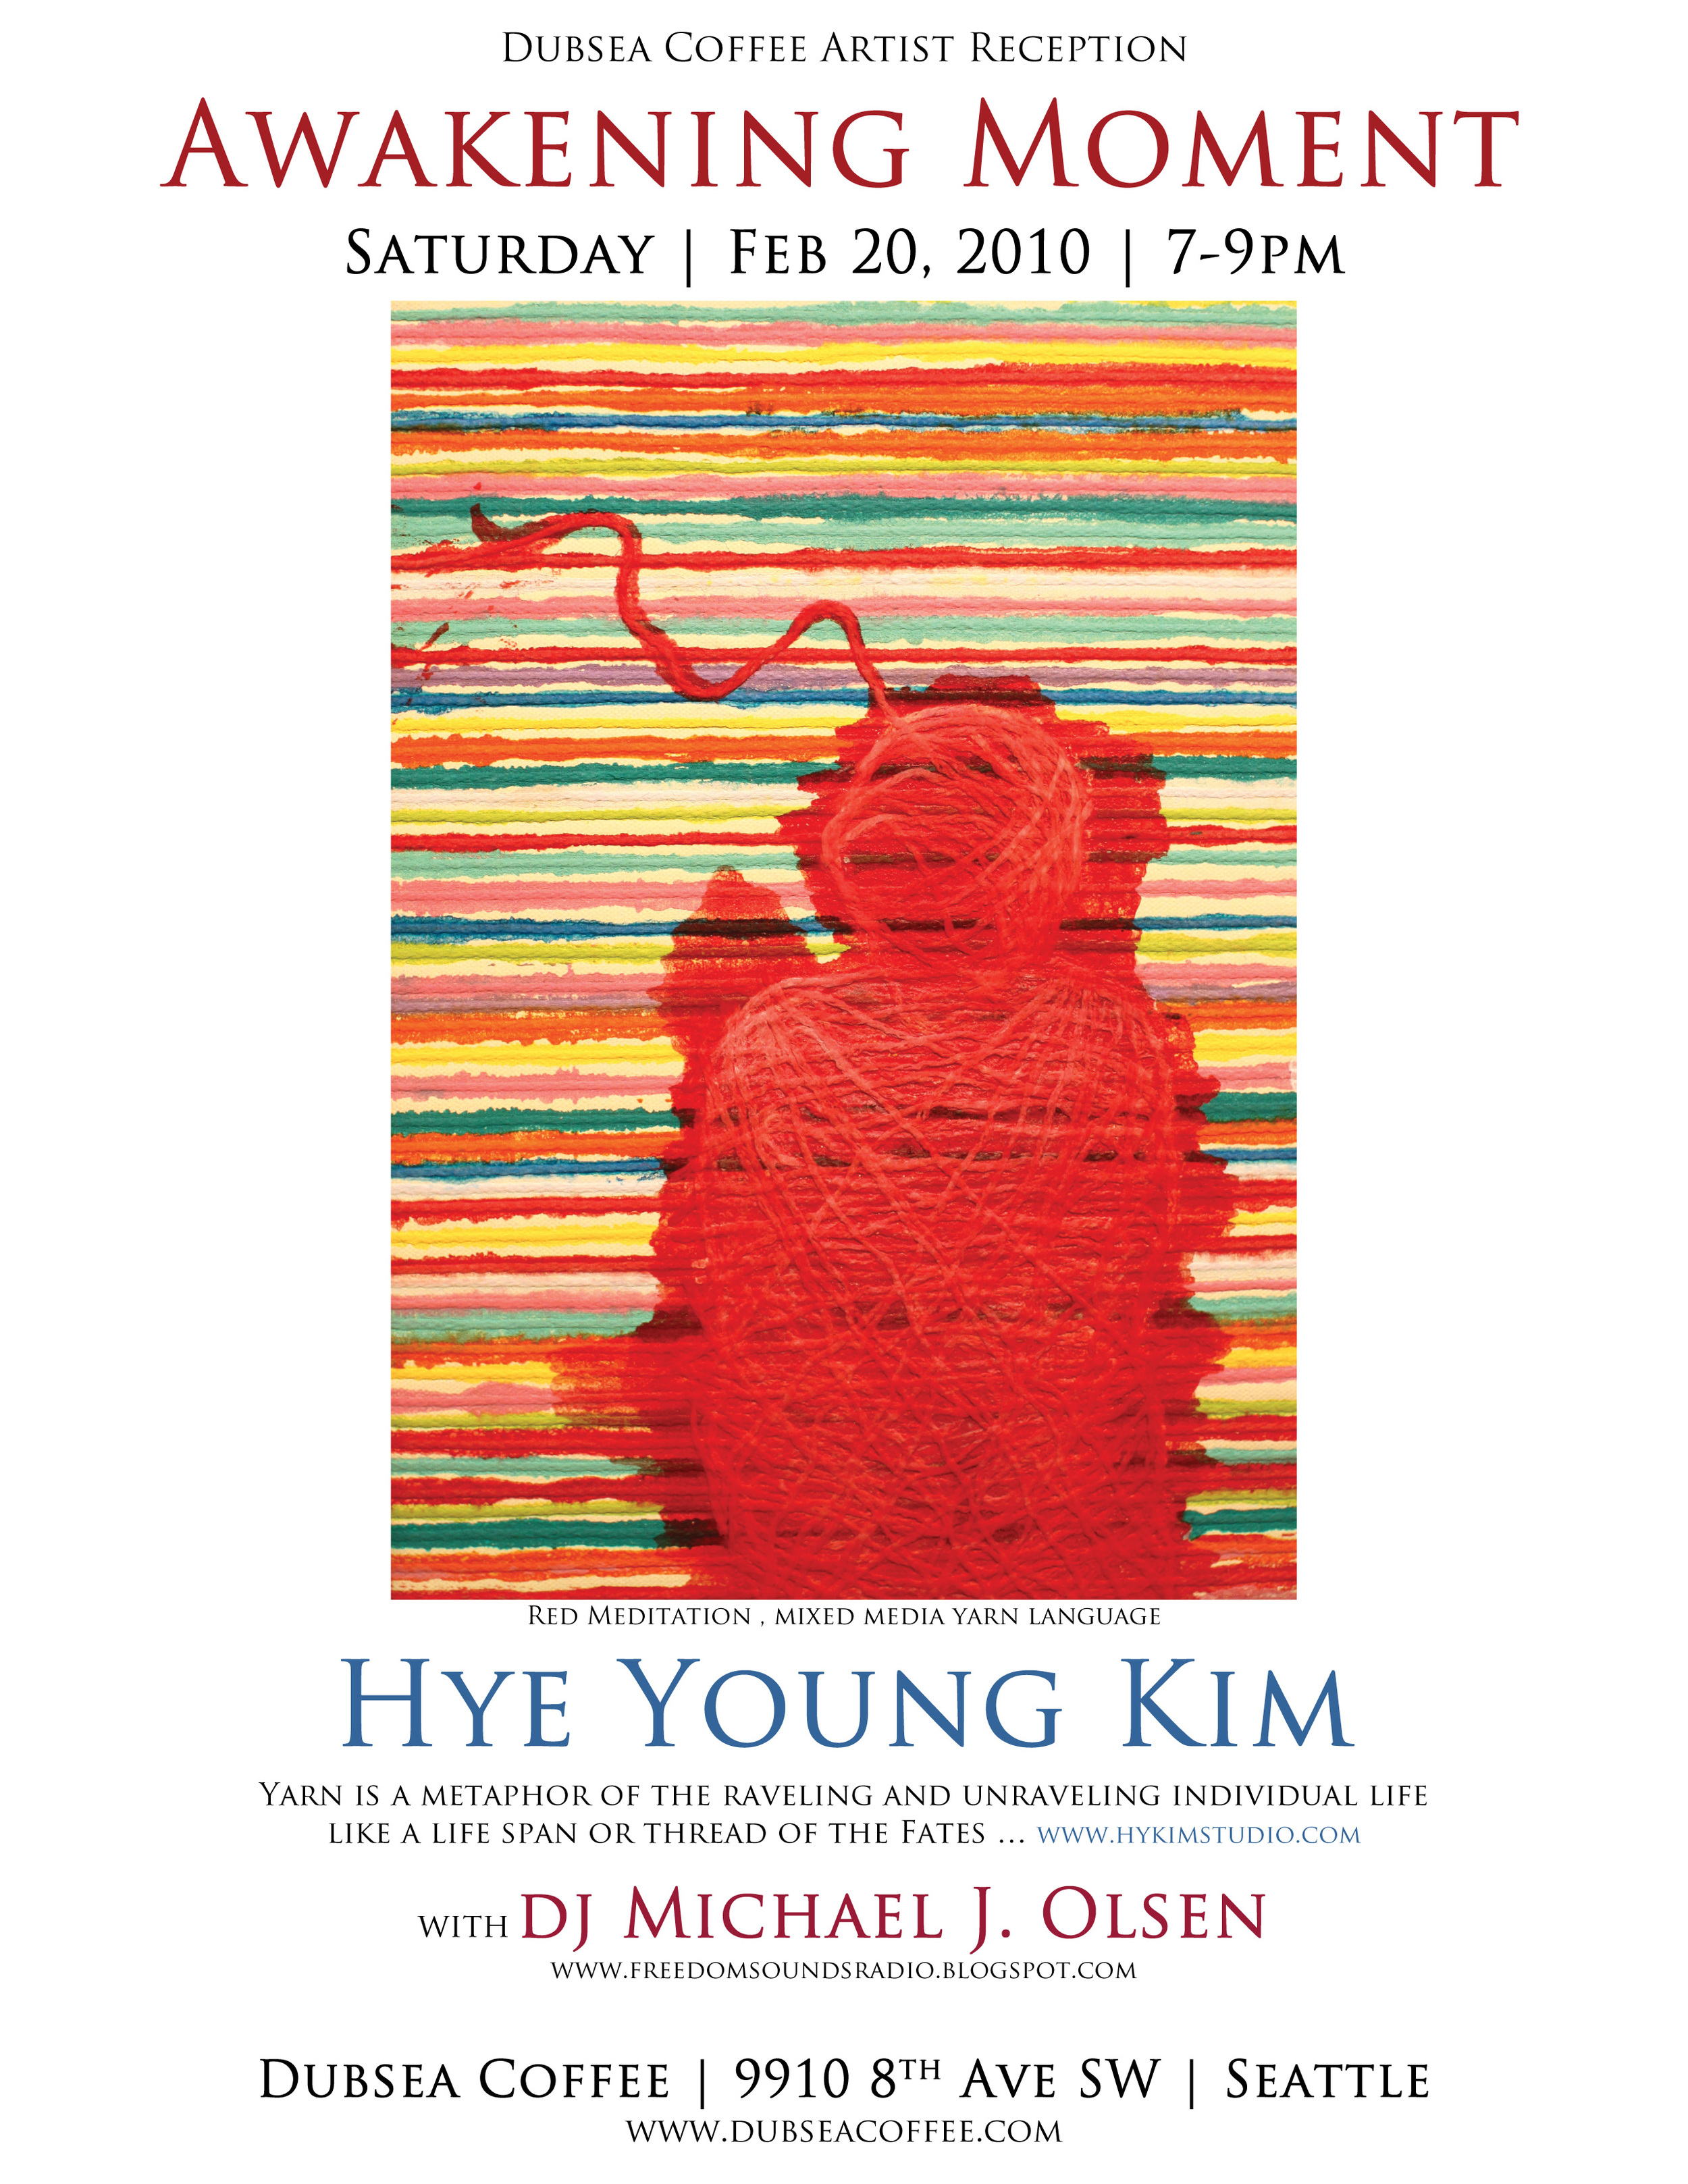 http://art-tech.arts.ufl.edu/~hyeyoungkim/page/contact.html